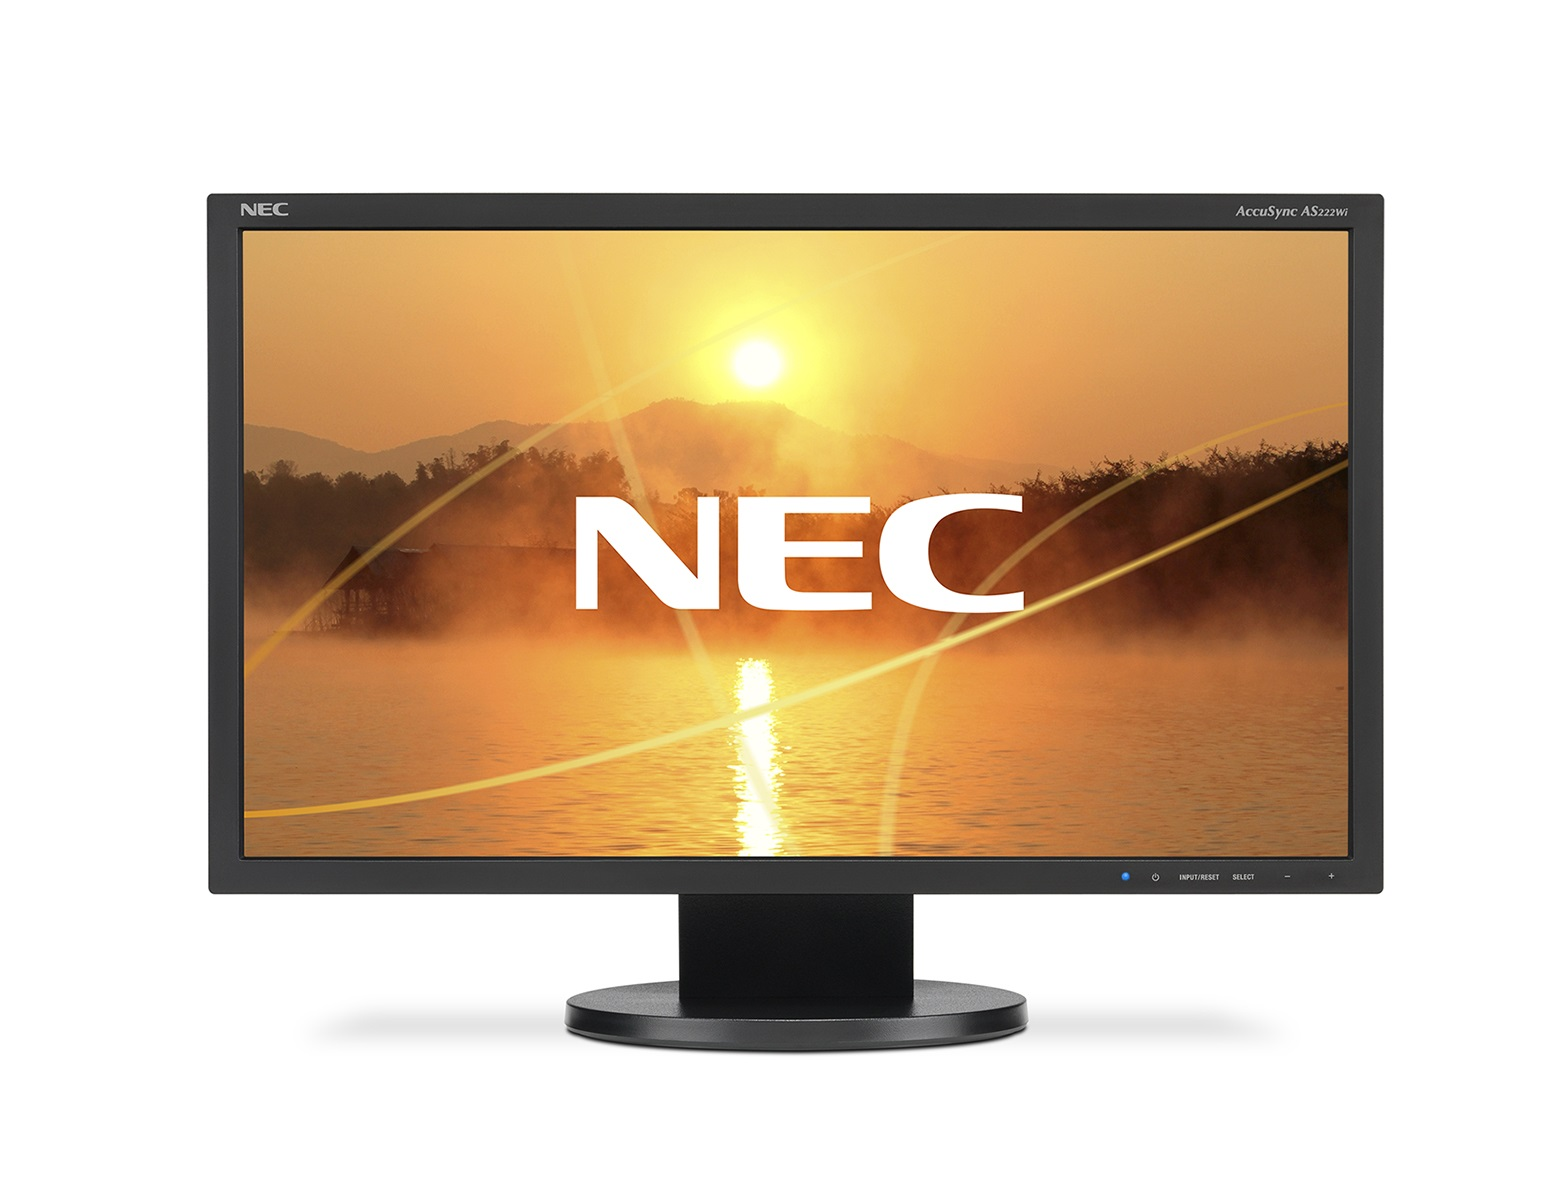 22' LCD NEC AS222Wi - Full HD, DVI, rep